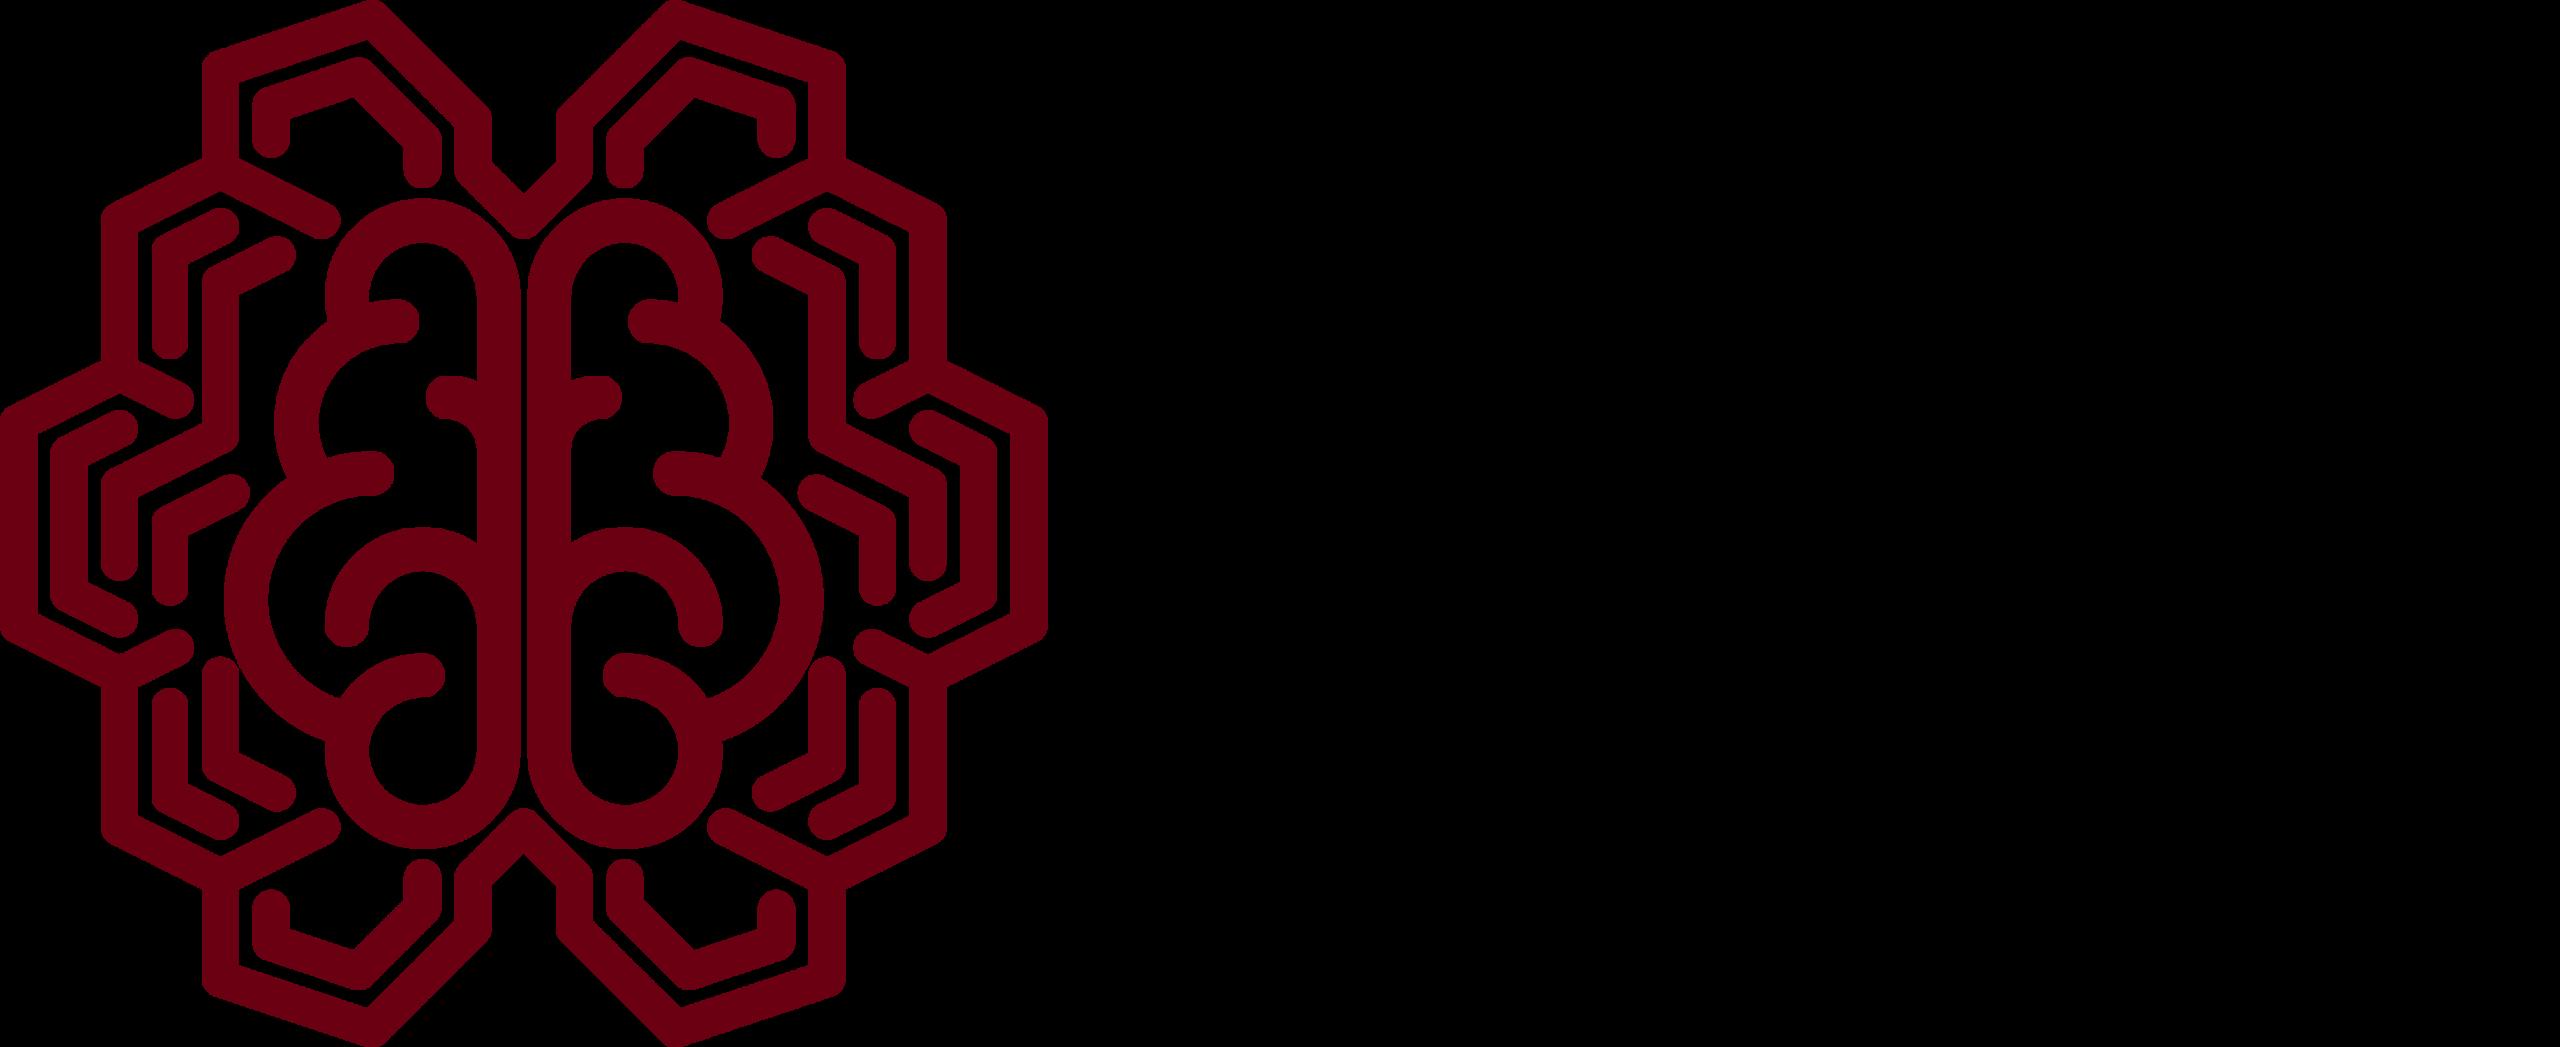 defrg.org